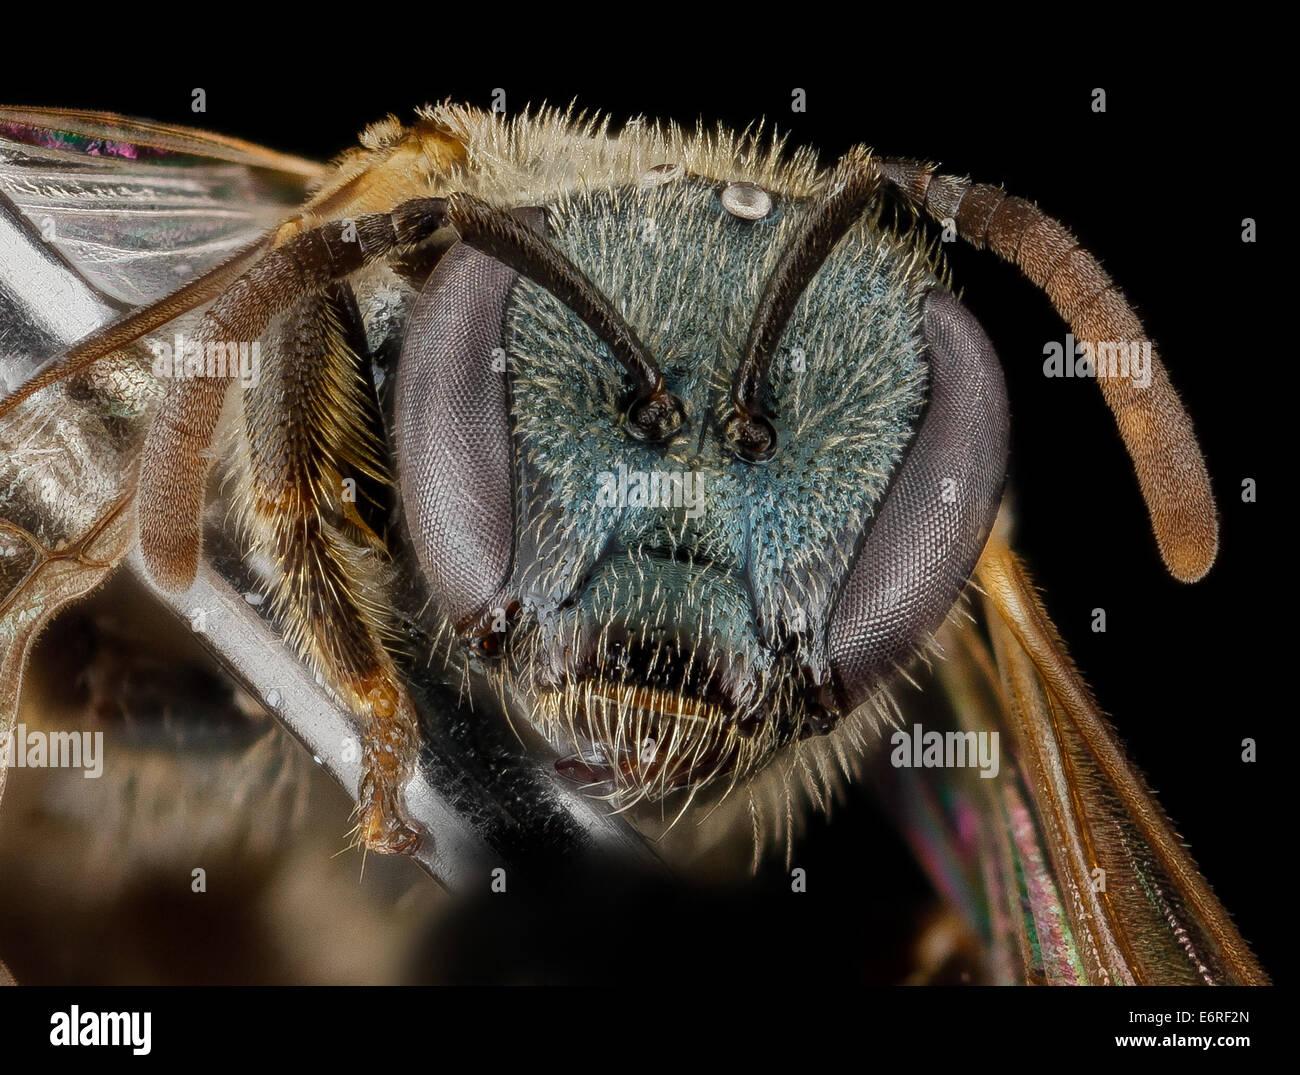 Lasioglossum floridanum, F, face, Georgia, Camden County_2013-02-22-183143 ZS PMax_10673021893_o One of the many - Stock Image